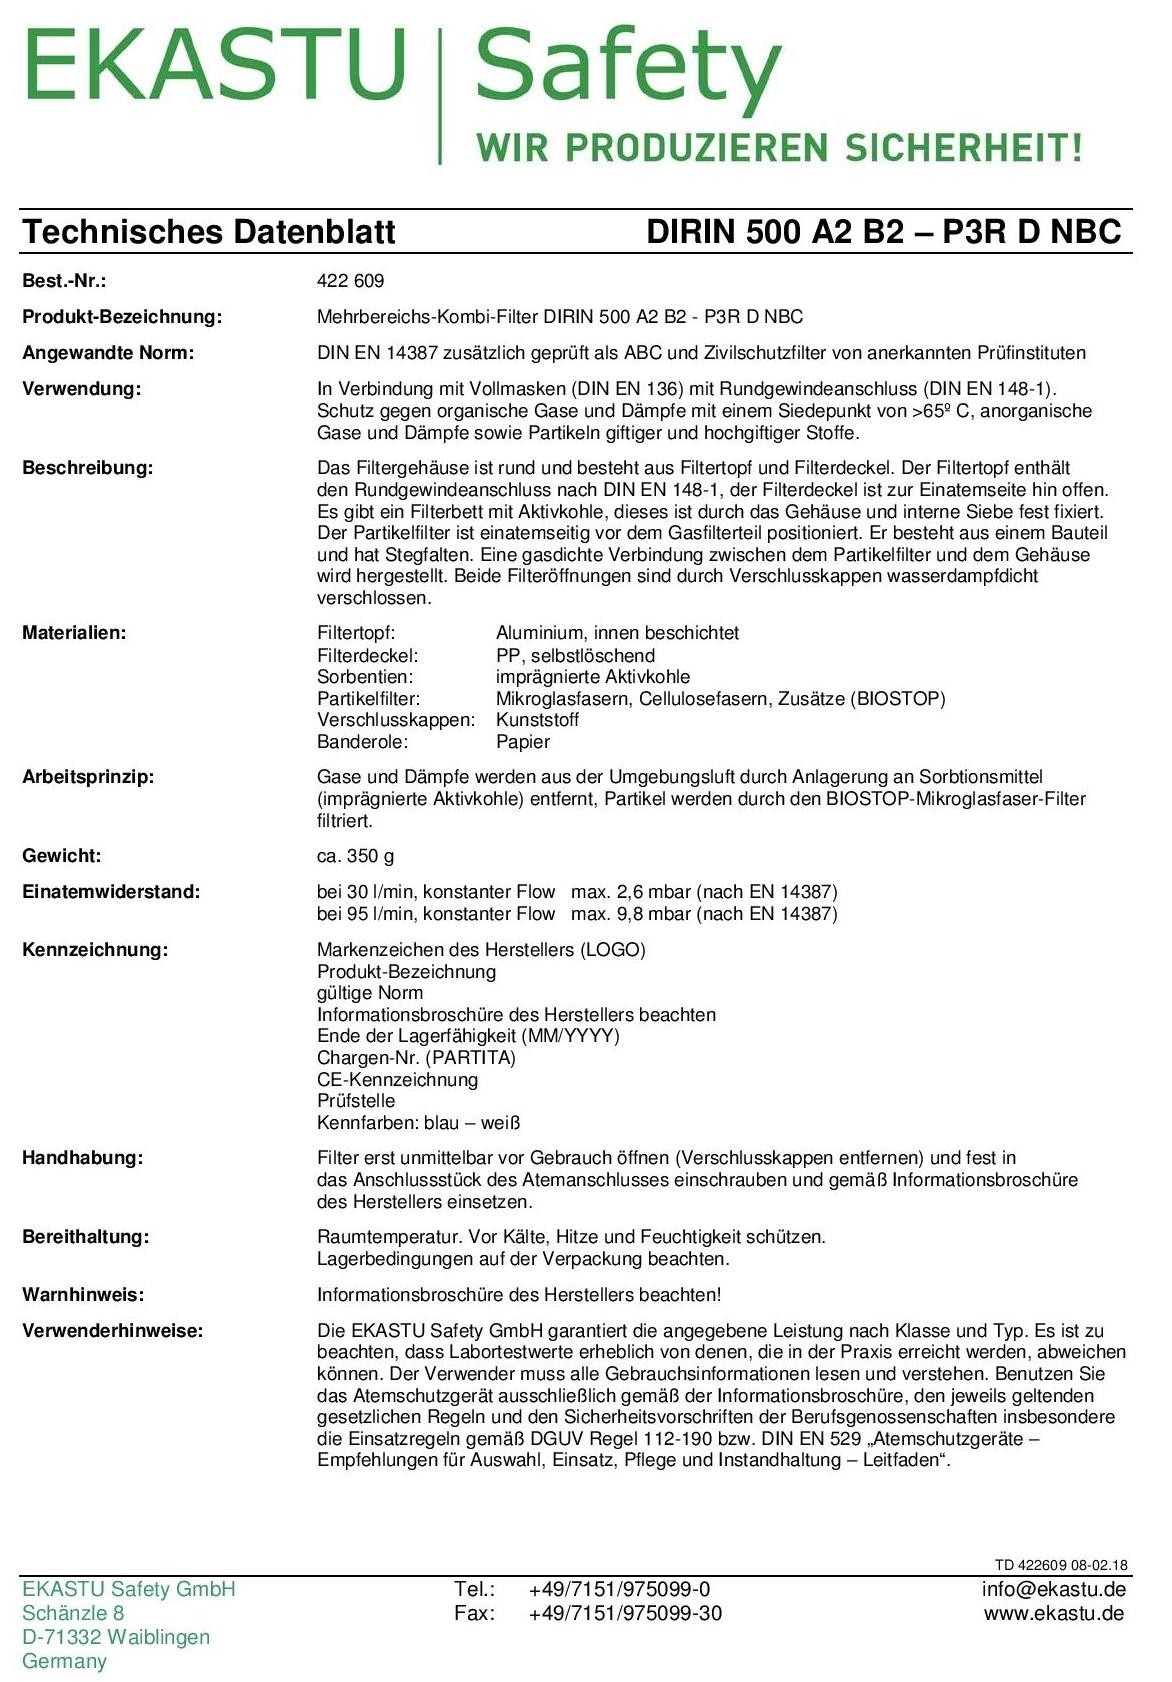 datenblatt-mehrbereichsfilter